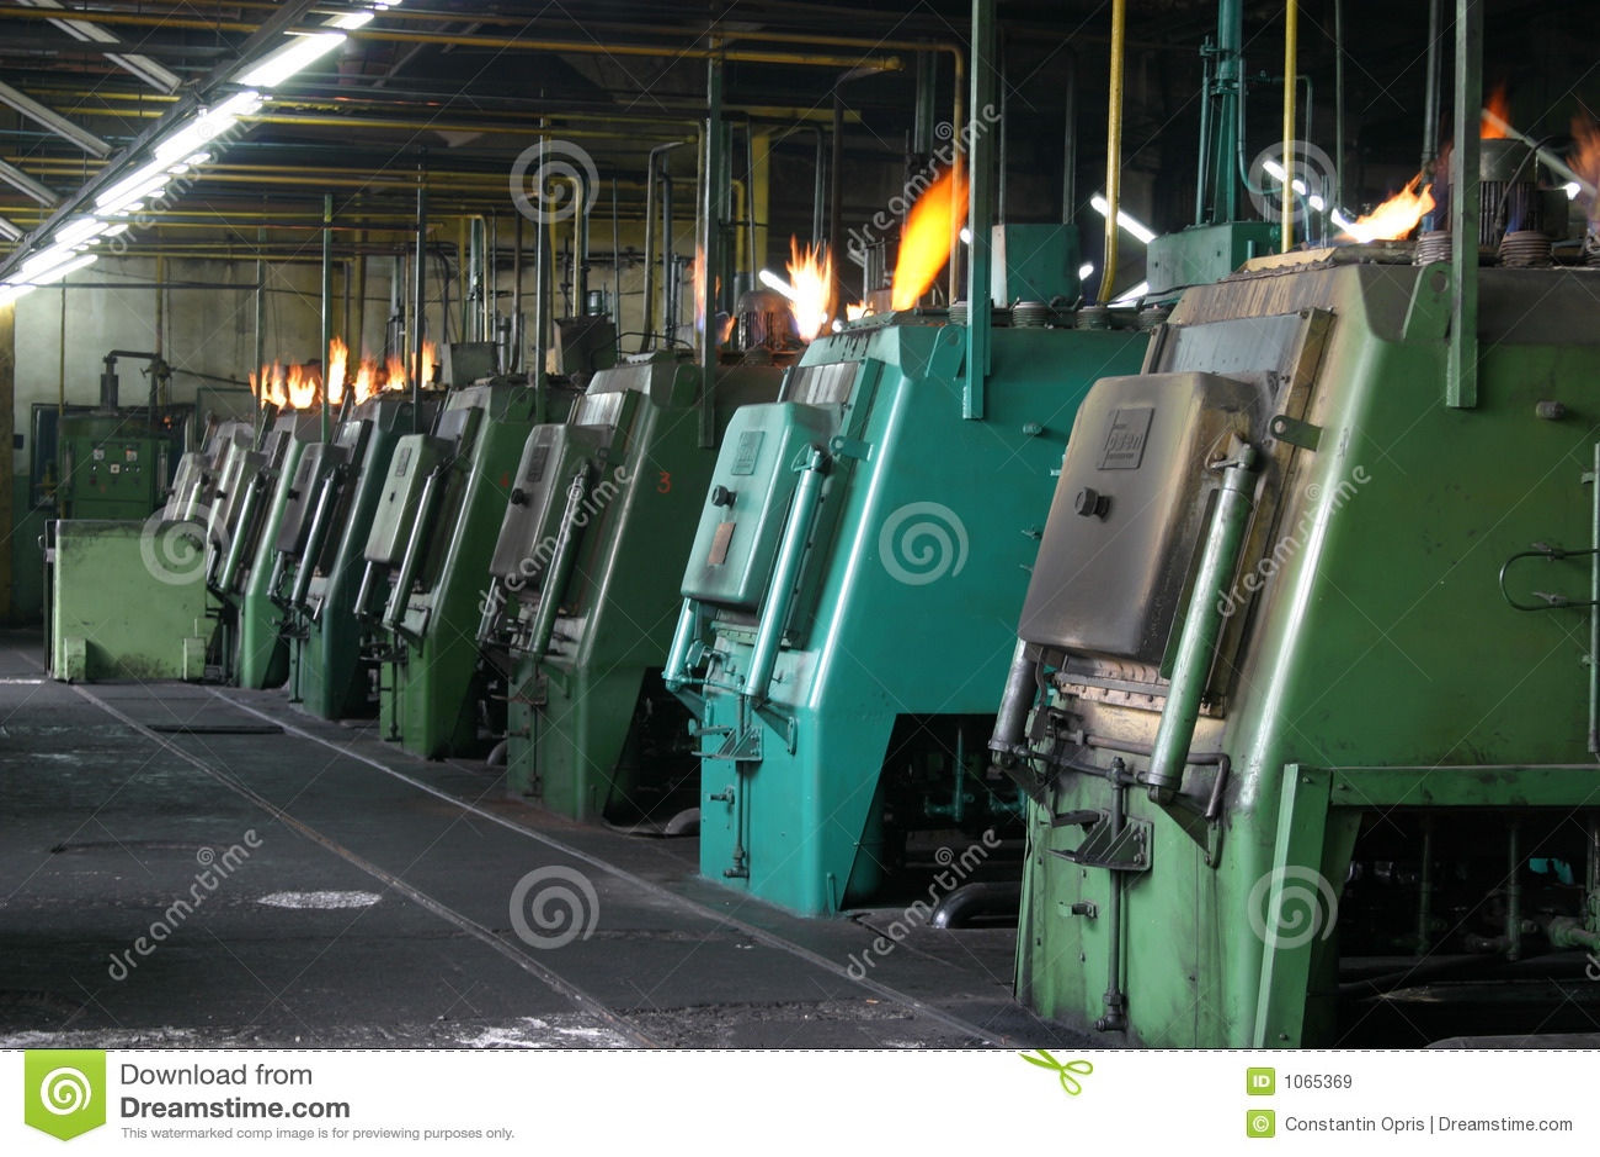 Metallurgic industry